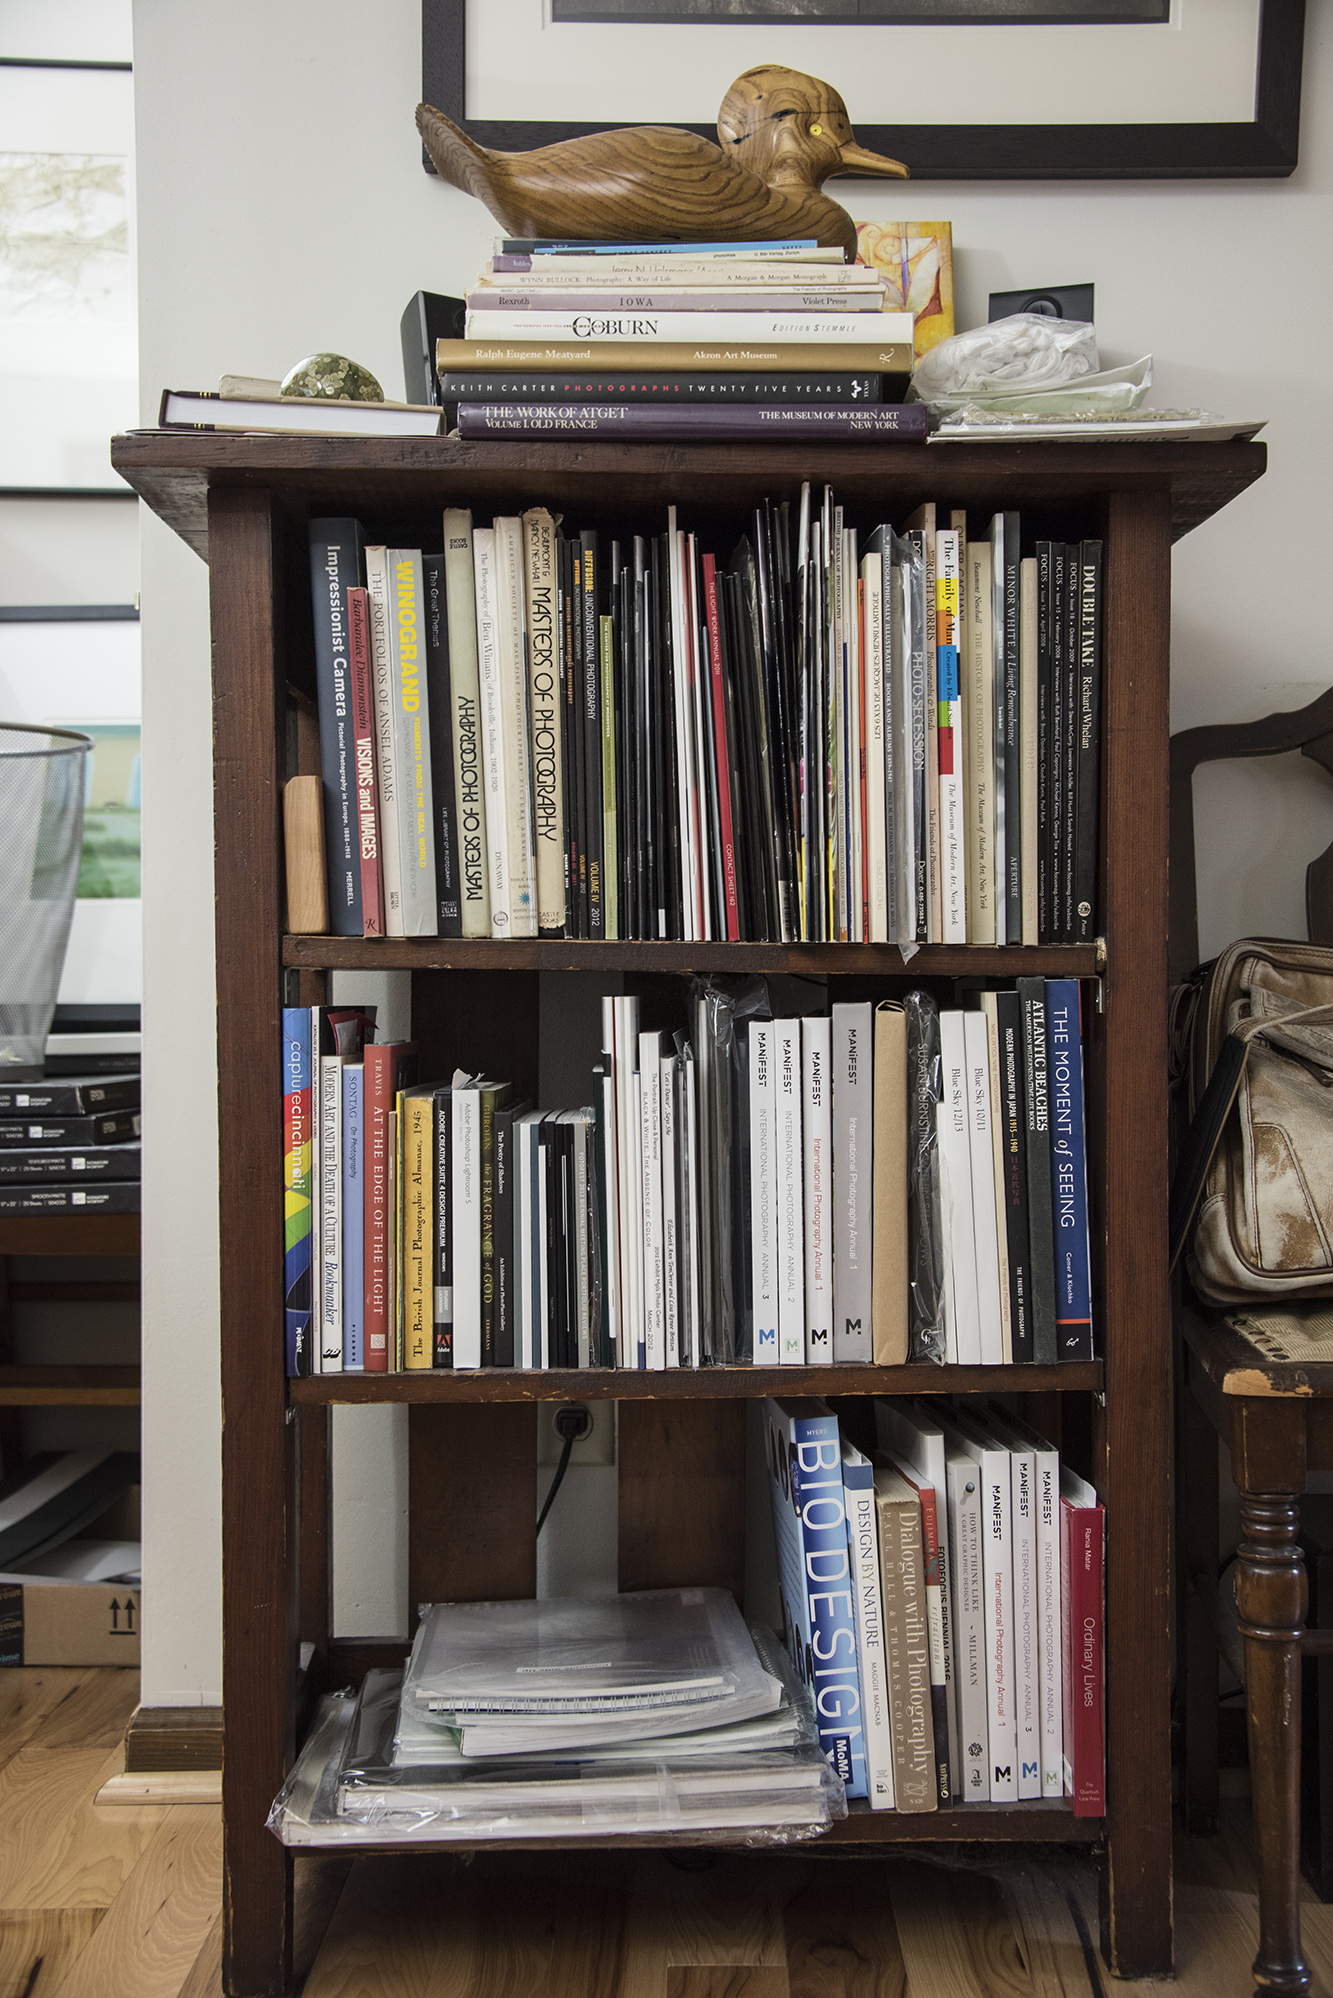 Kent Krugh 's mallard-topped photobook library.